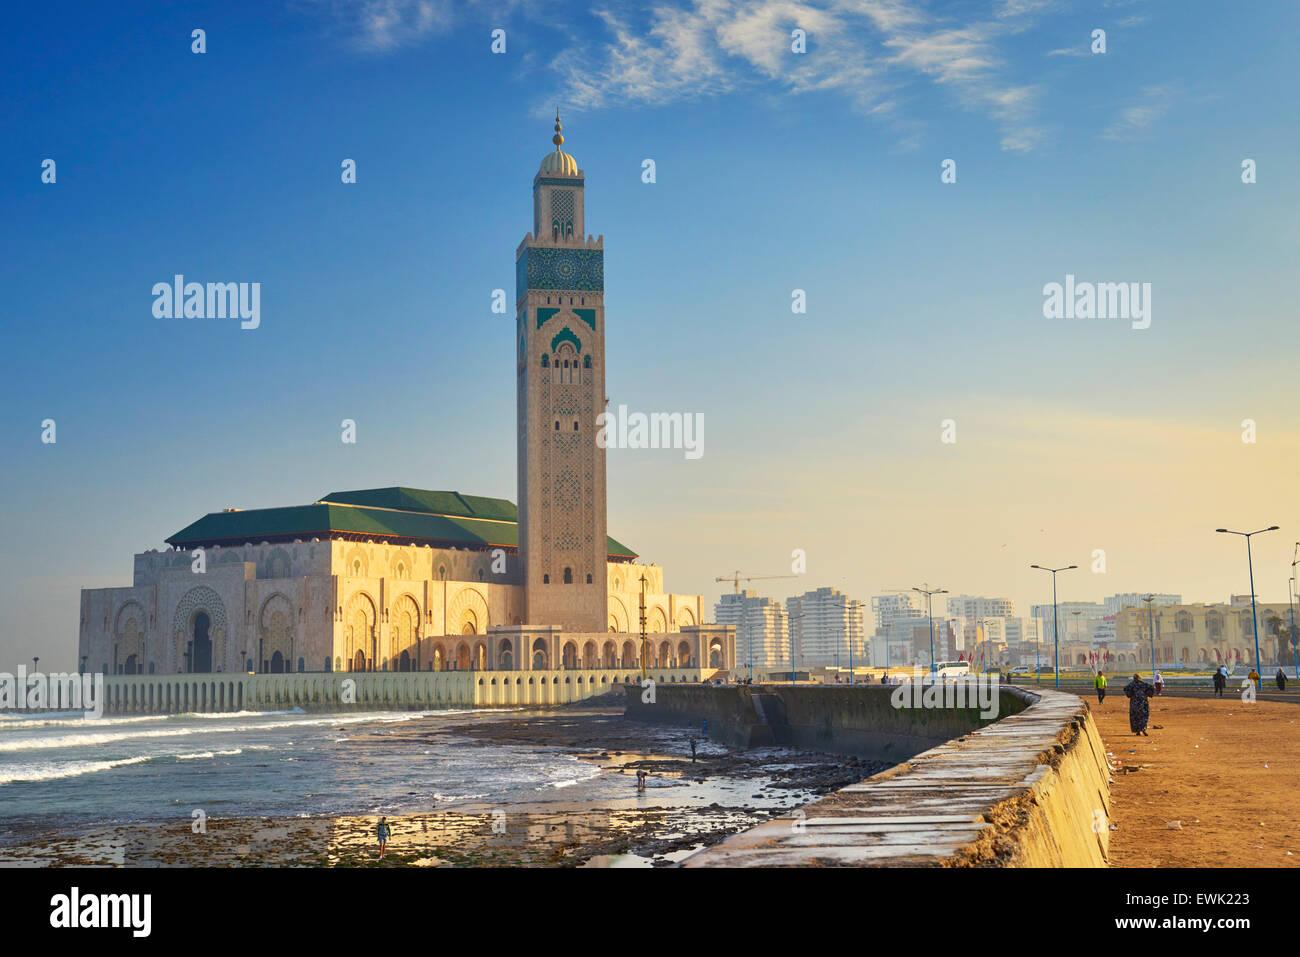 Hassan II Mosque, Casablanca, Morocco, Africa - Stock Image